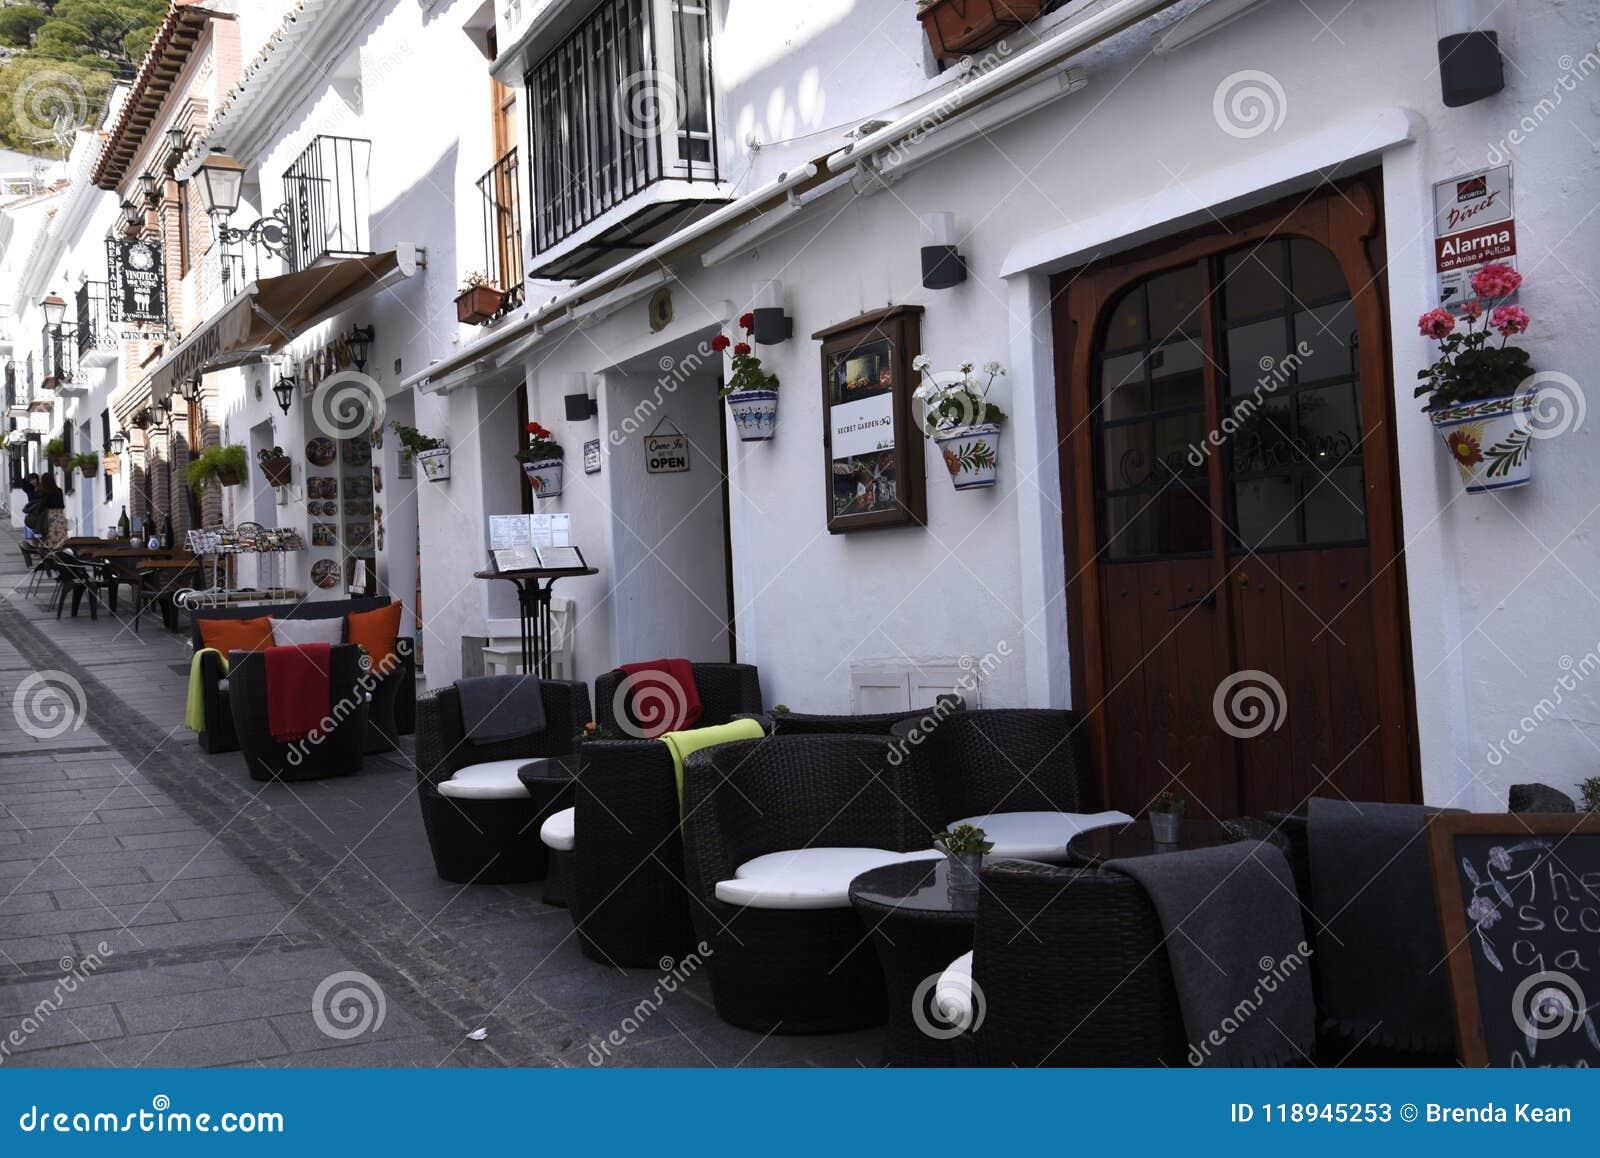 San Sebastian Street In Mijas In The Mountains Above The